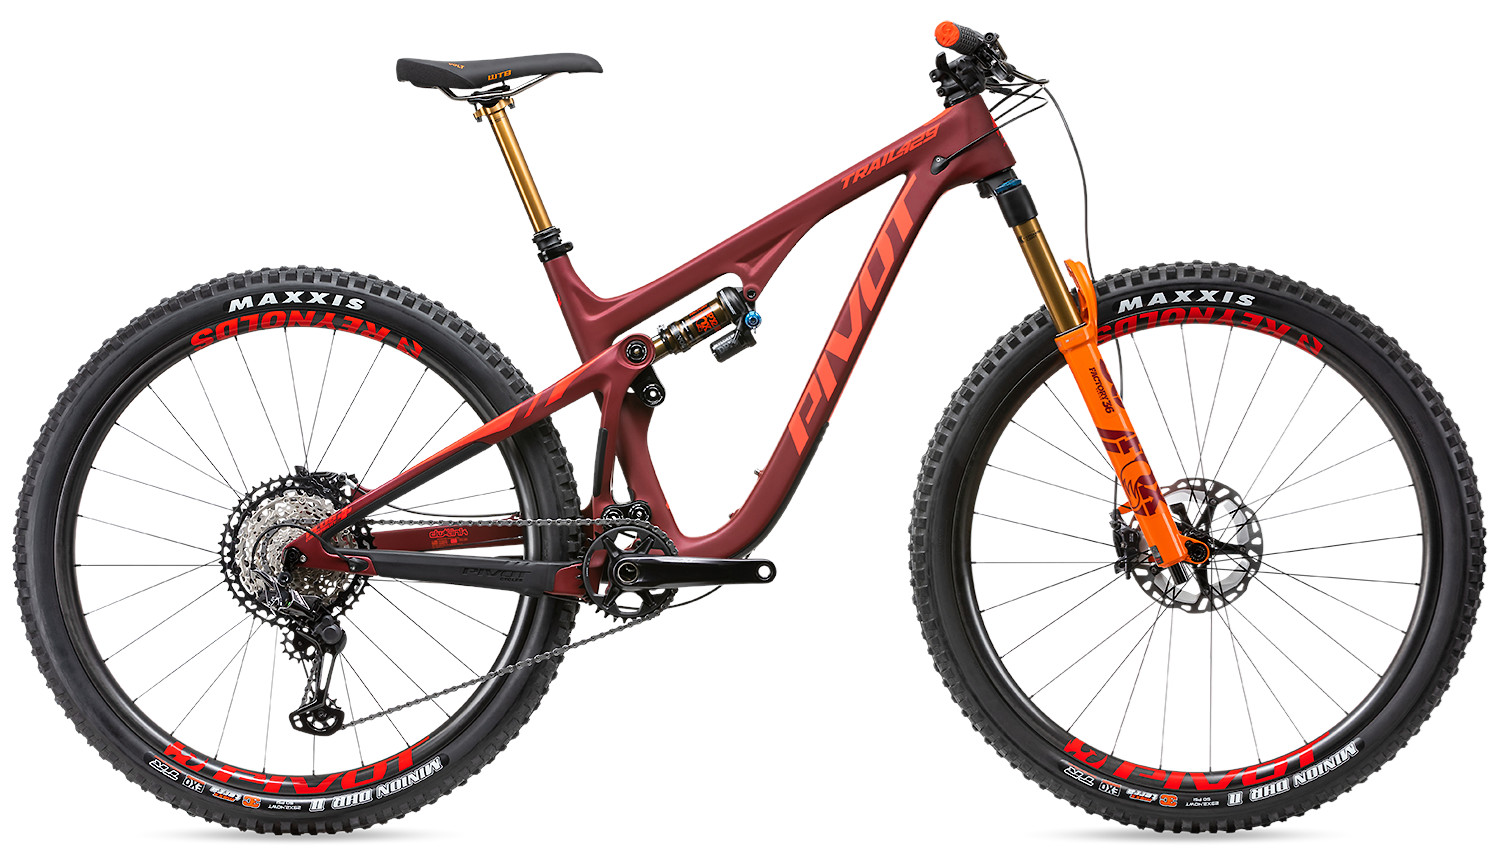 2020 Pivot Trail 429 Limited Edition Enduro Pro XT XTR 12 Speed Crimson